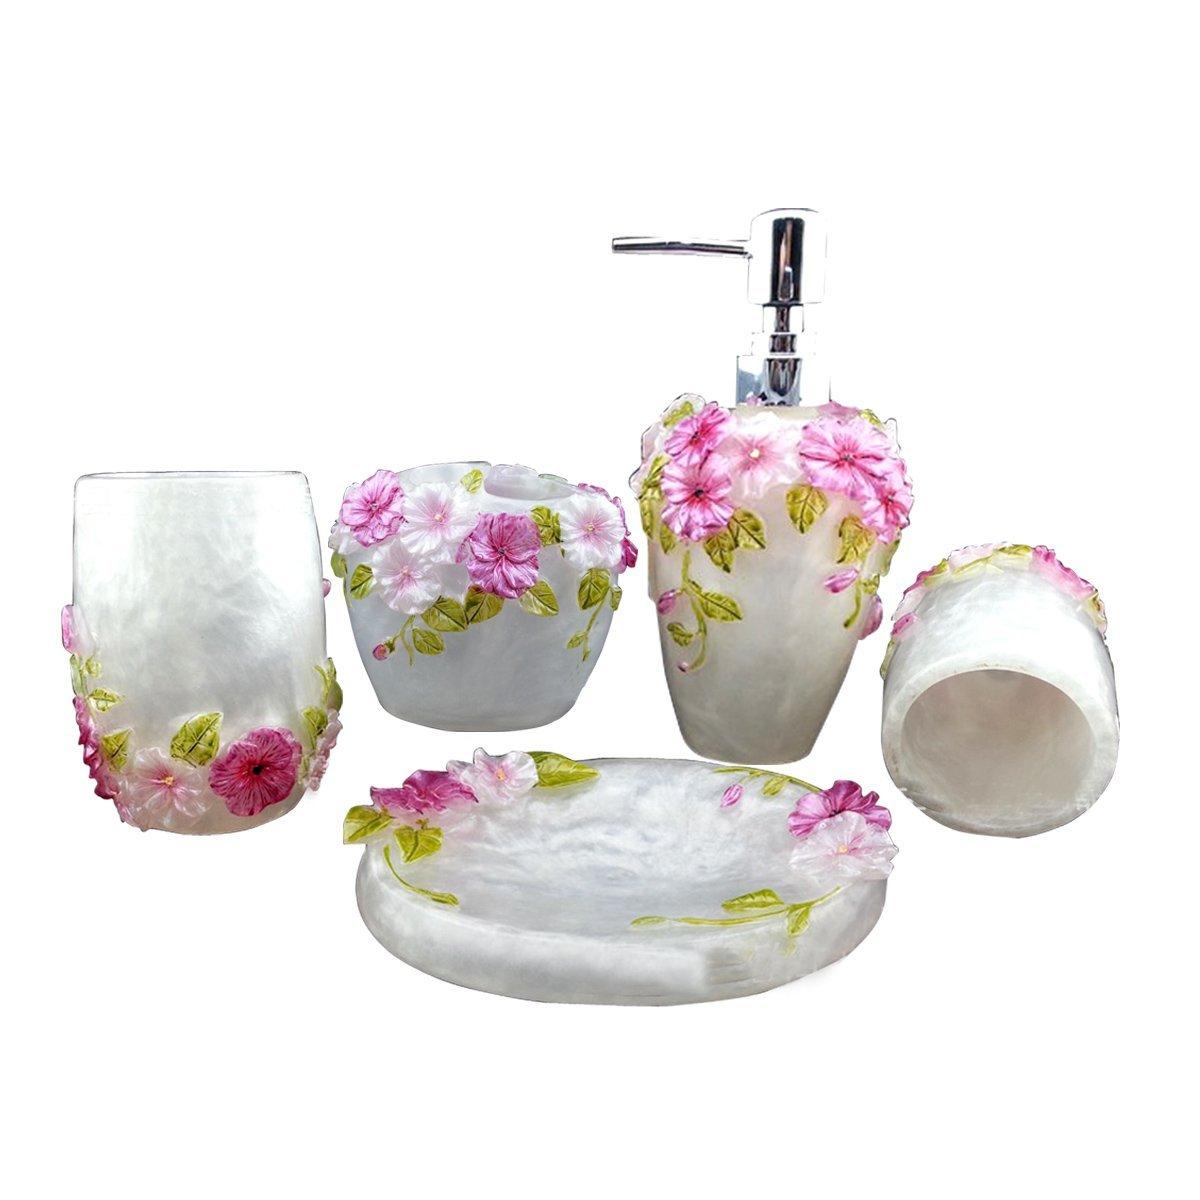 HQdeal 5PC Set Acrylic Bathroom Accessories Bathroom Set - White ...